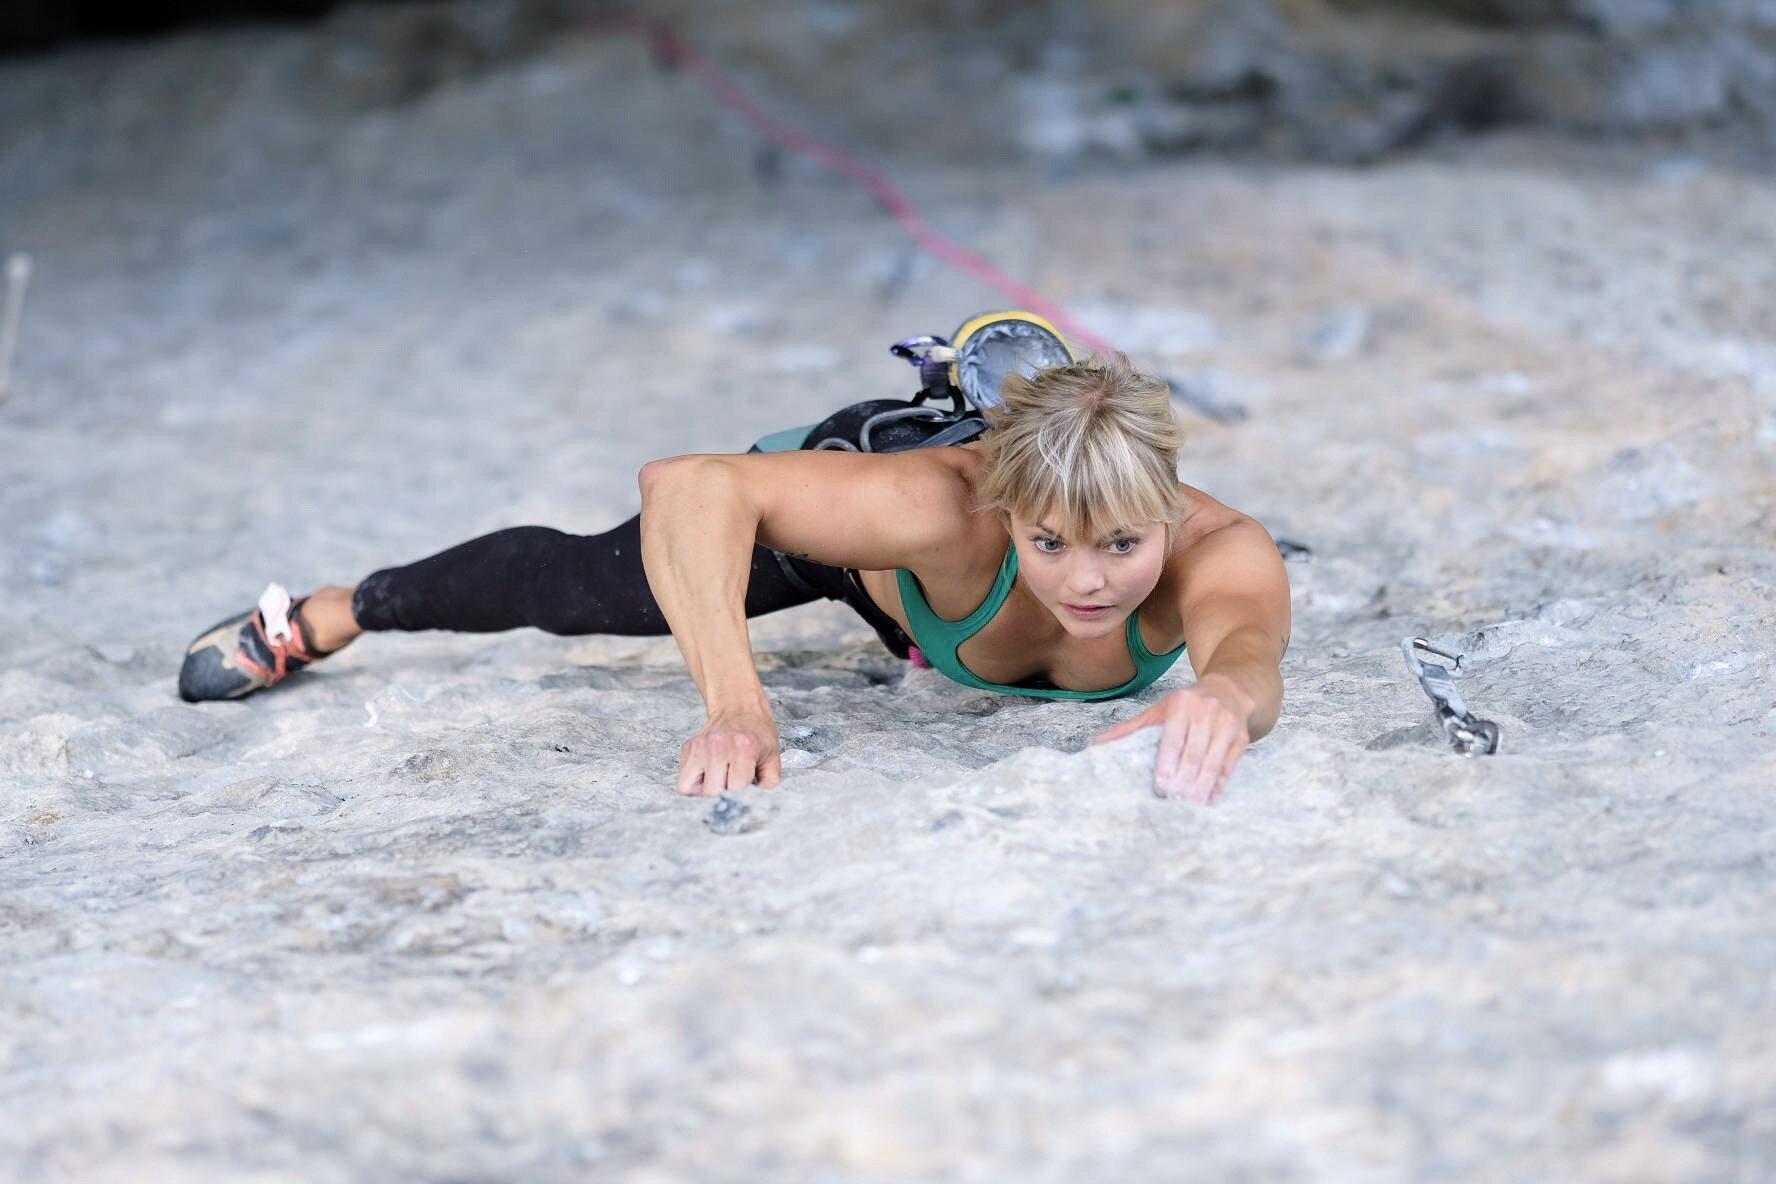 Climbing in Voralpsee, picture by Lukas Neugebauer (2019). Stamina camp <3